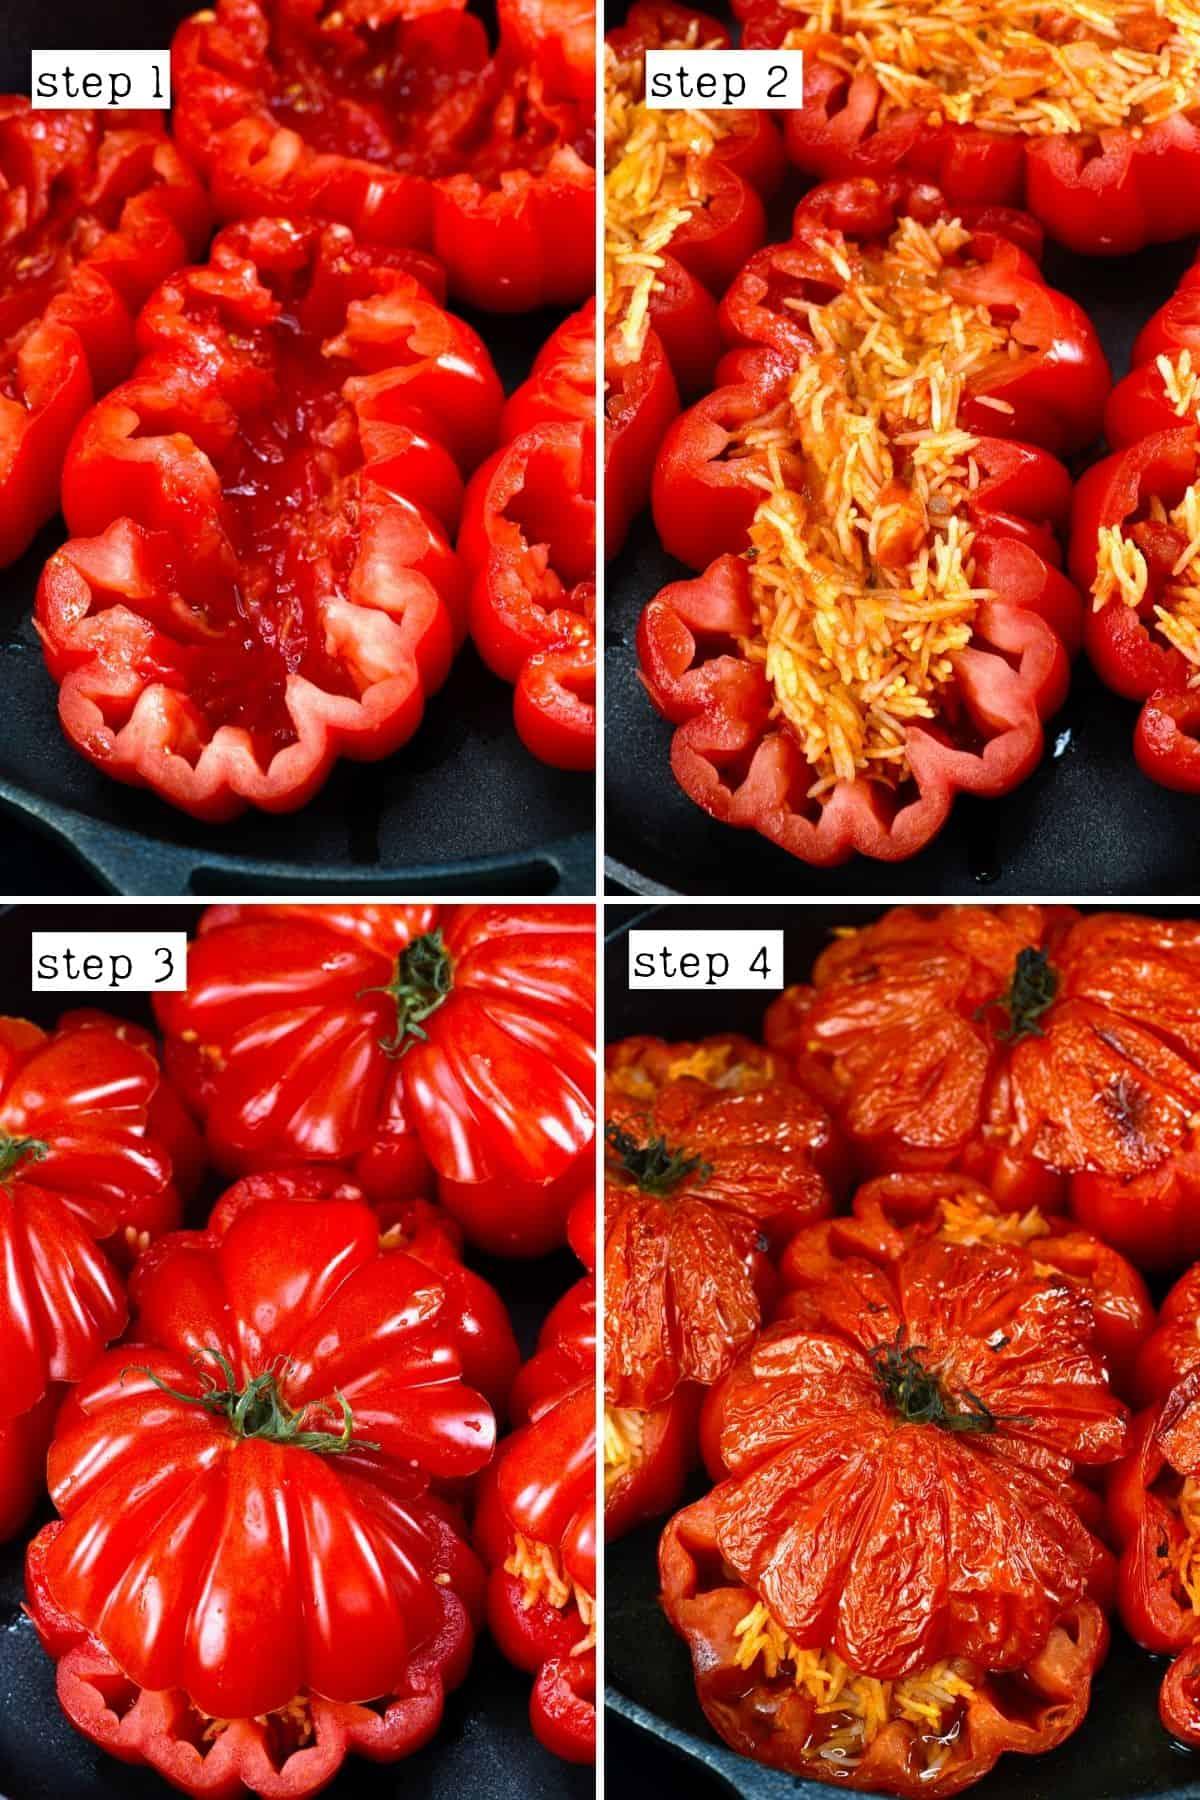 Steps for preparing stuffed tomatoes